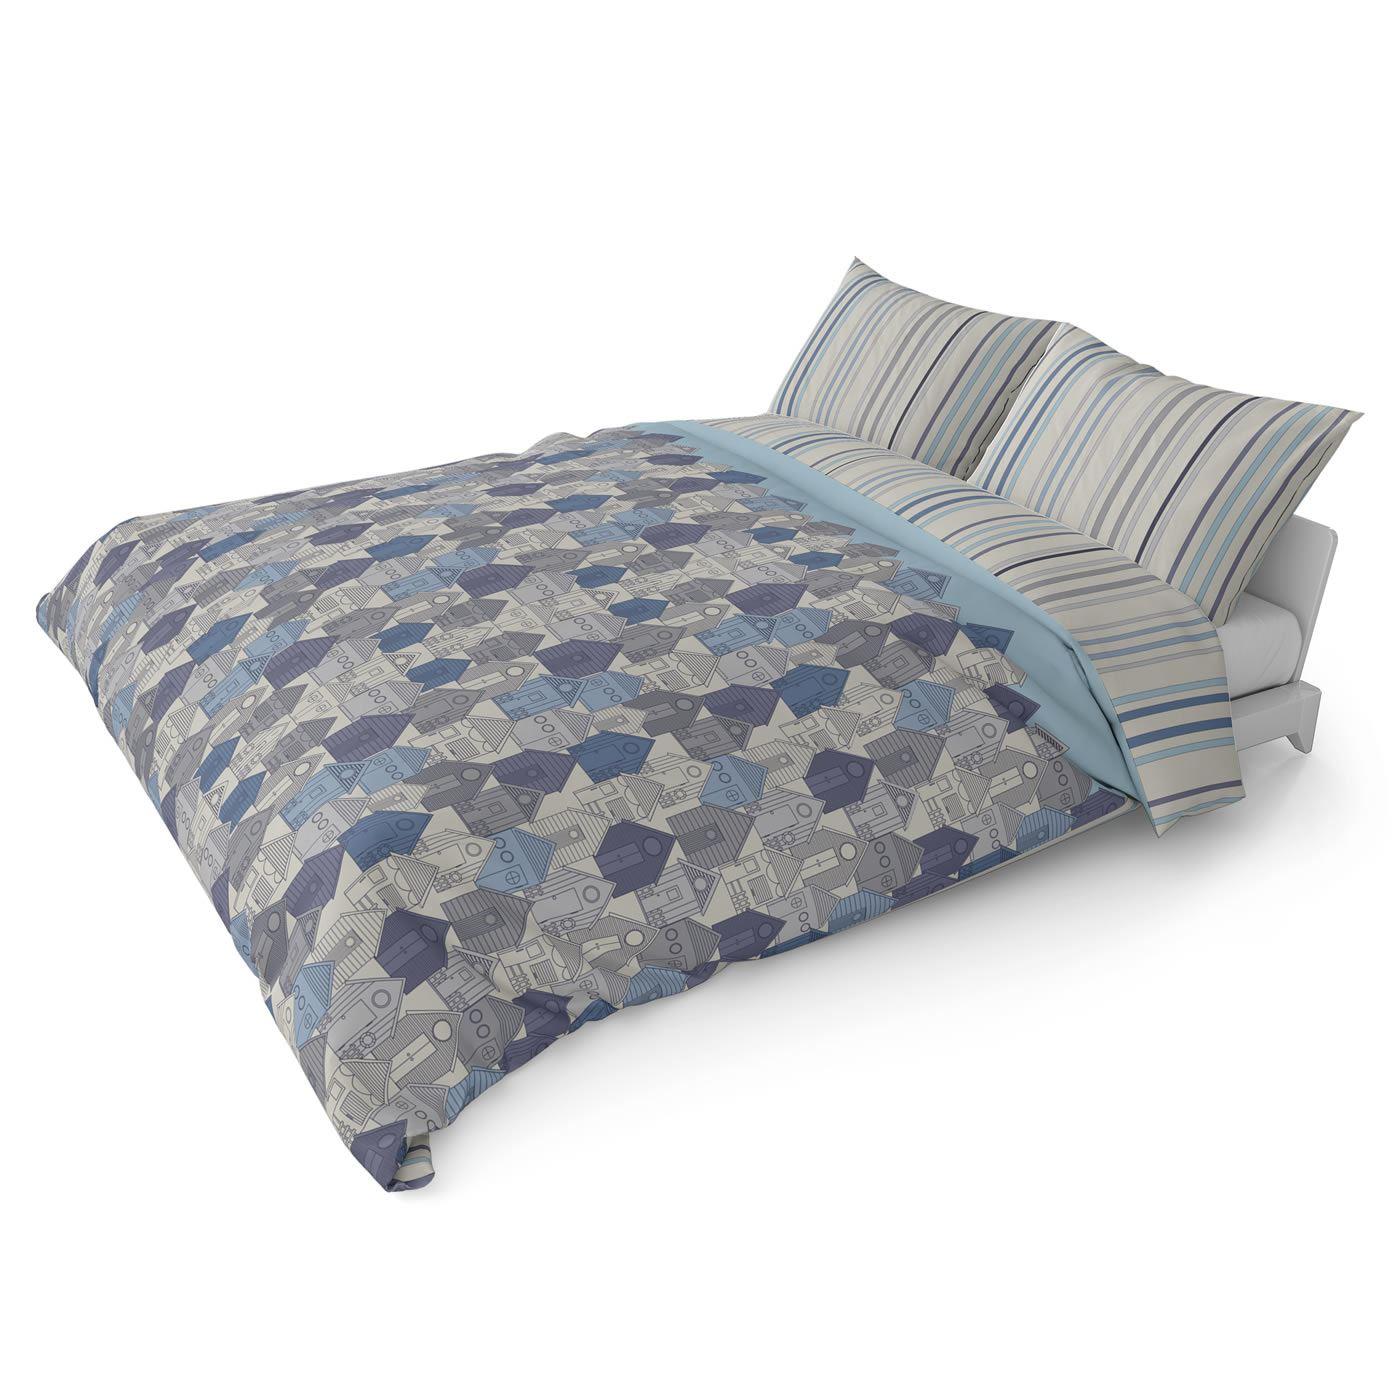 Funda-nordica-azul-azul-marino-verde-azulado-edredon-algodon-estampado-juego-conjuntos-de-cama-cubre miniatura 47